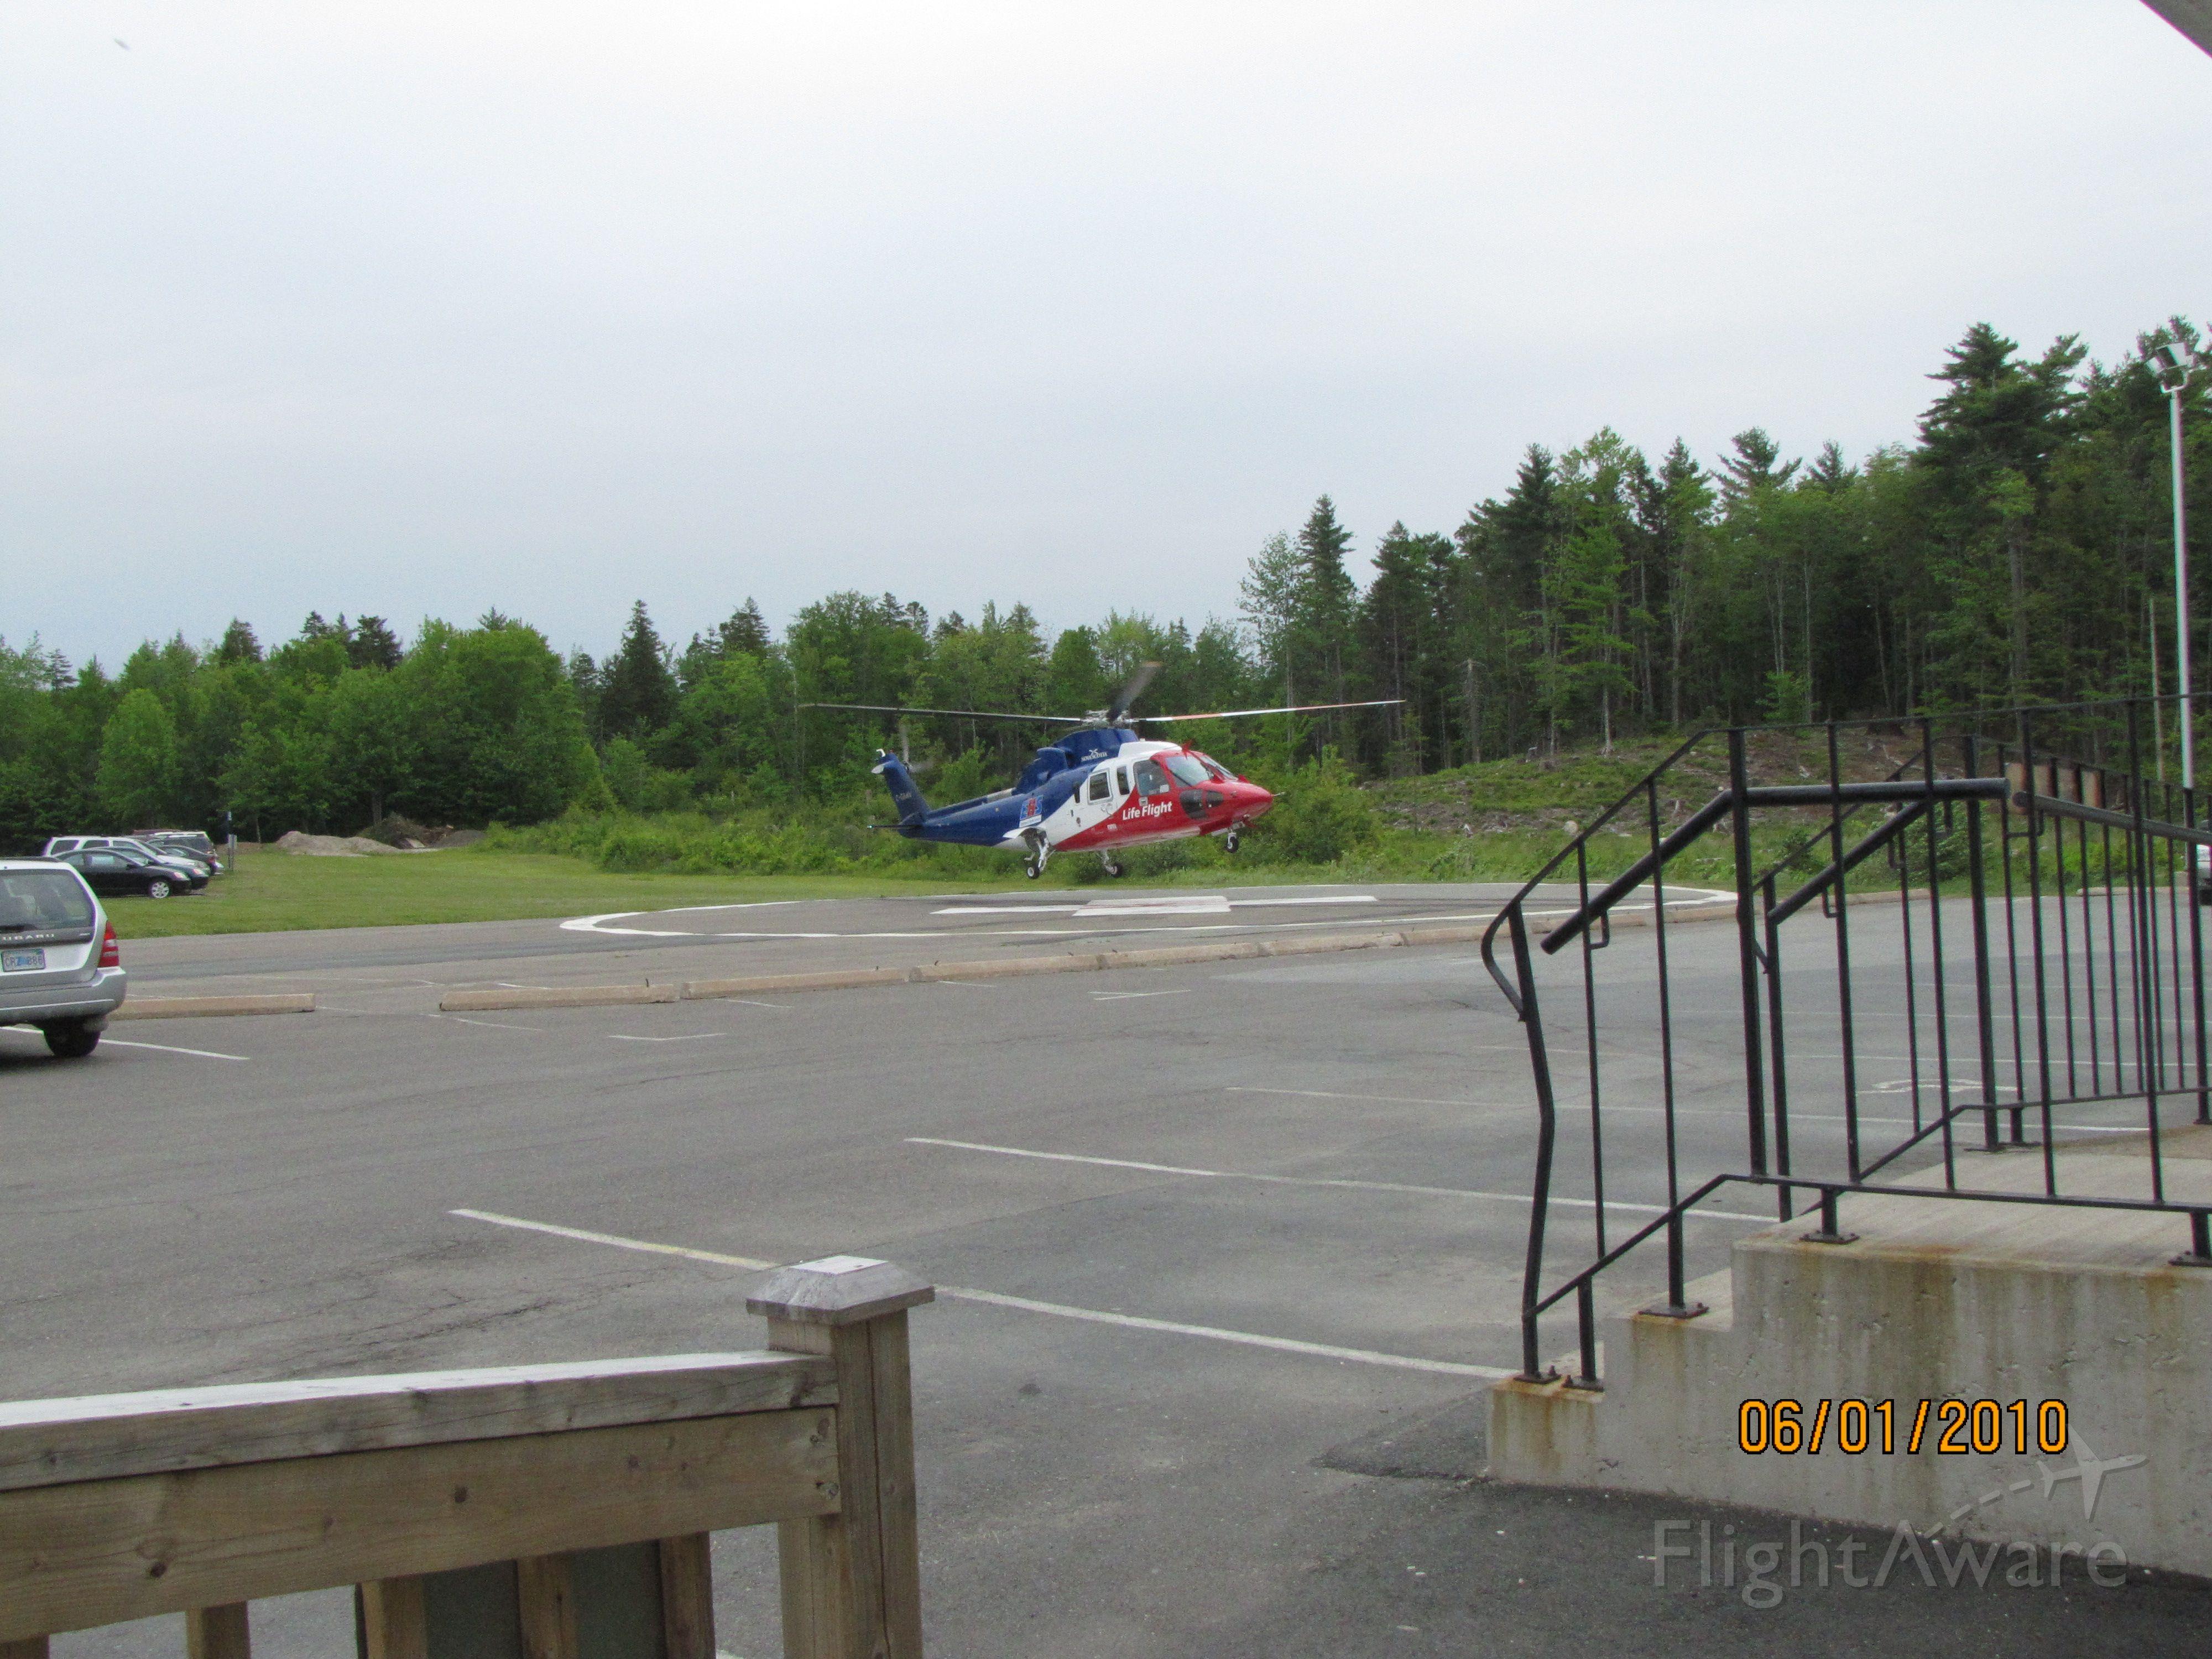 C-GIMN — - Lifting off the Helipad at the Bridgewater Hospital.    June 1/2010